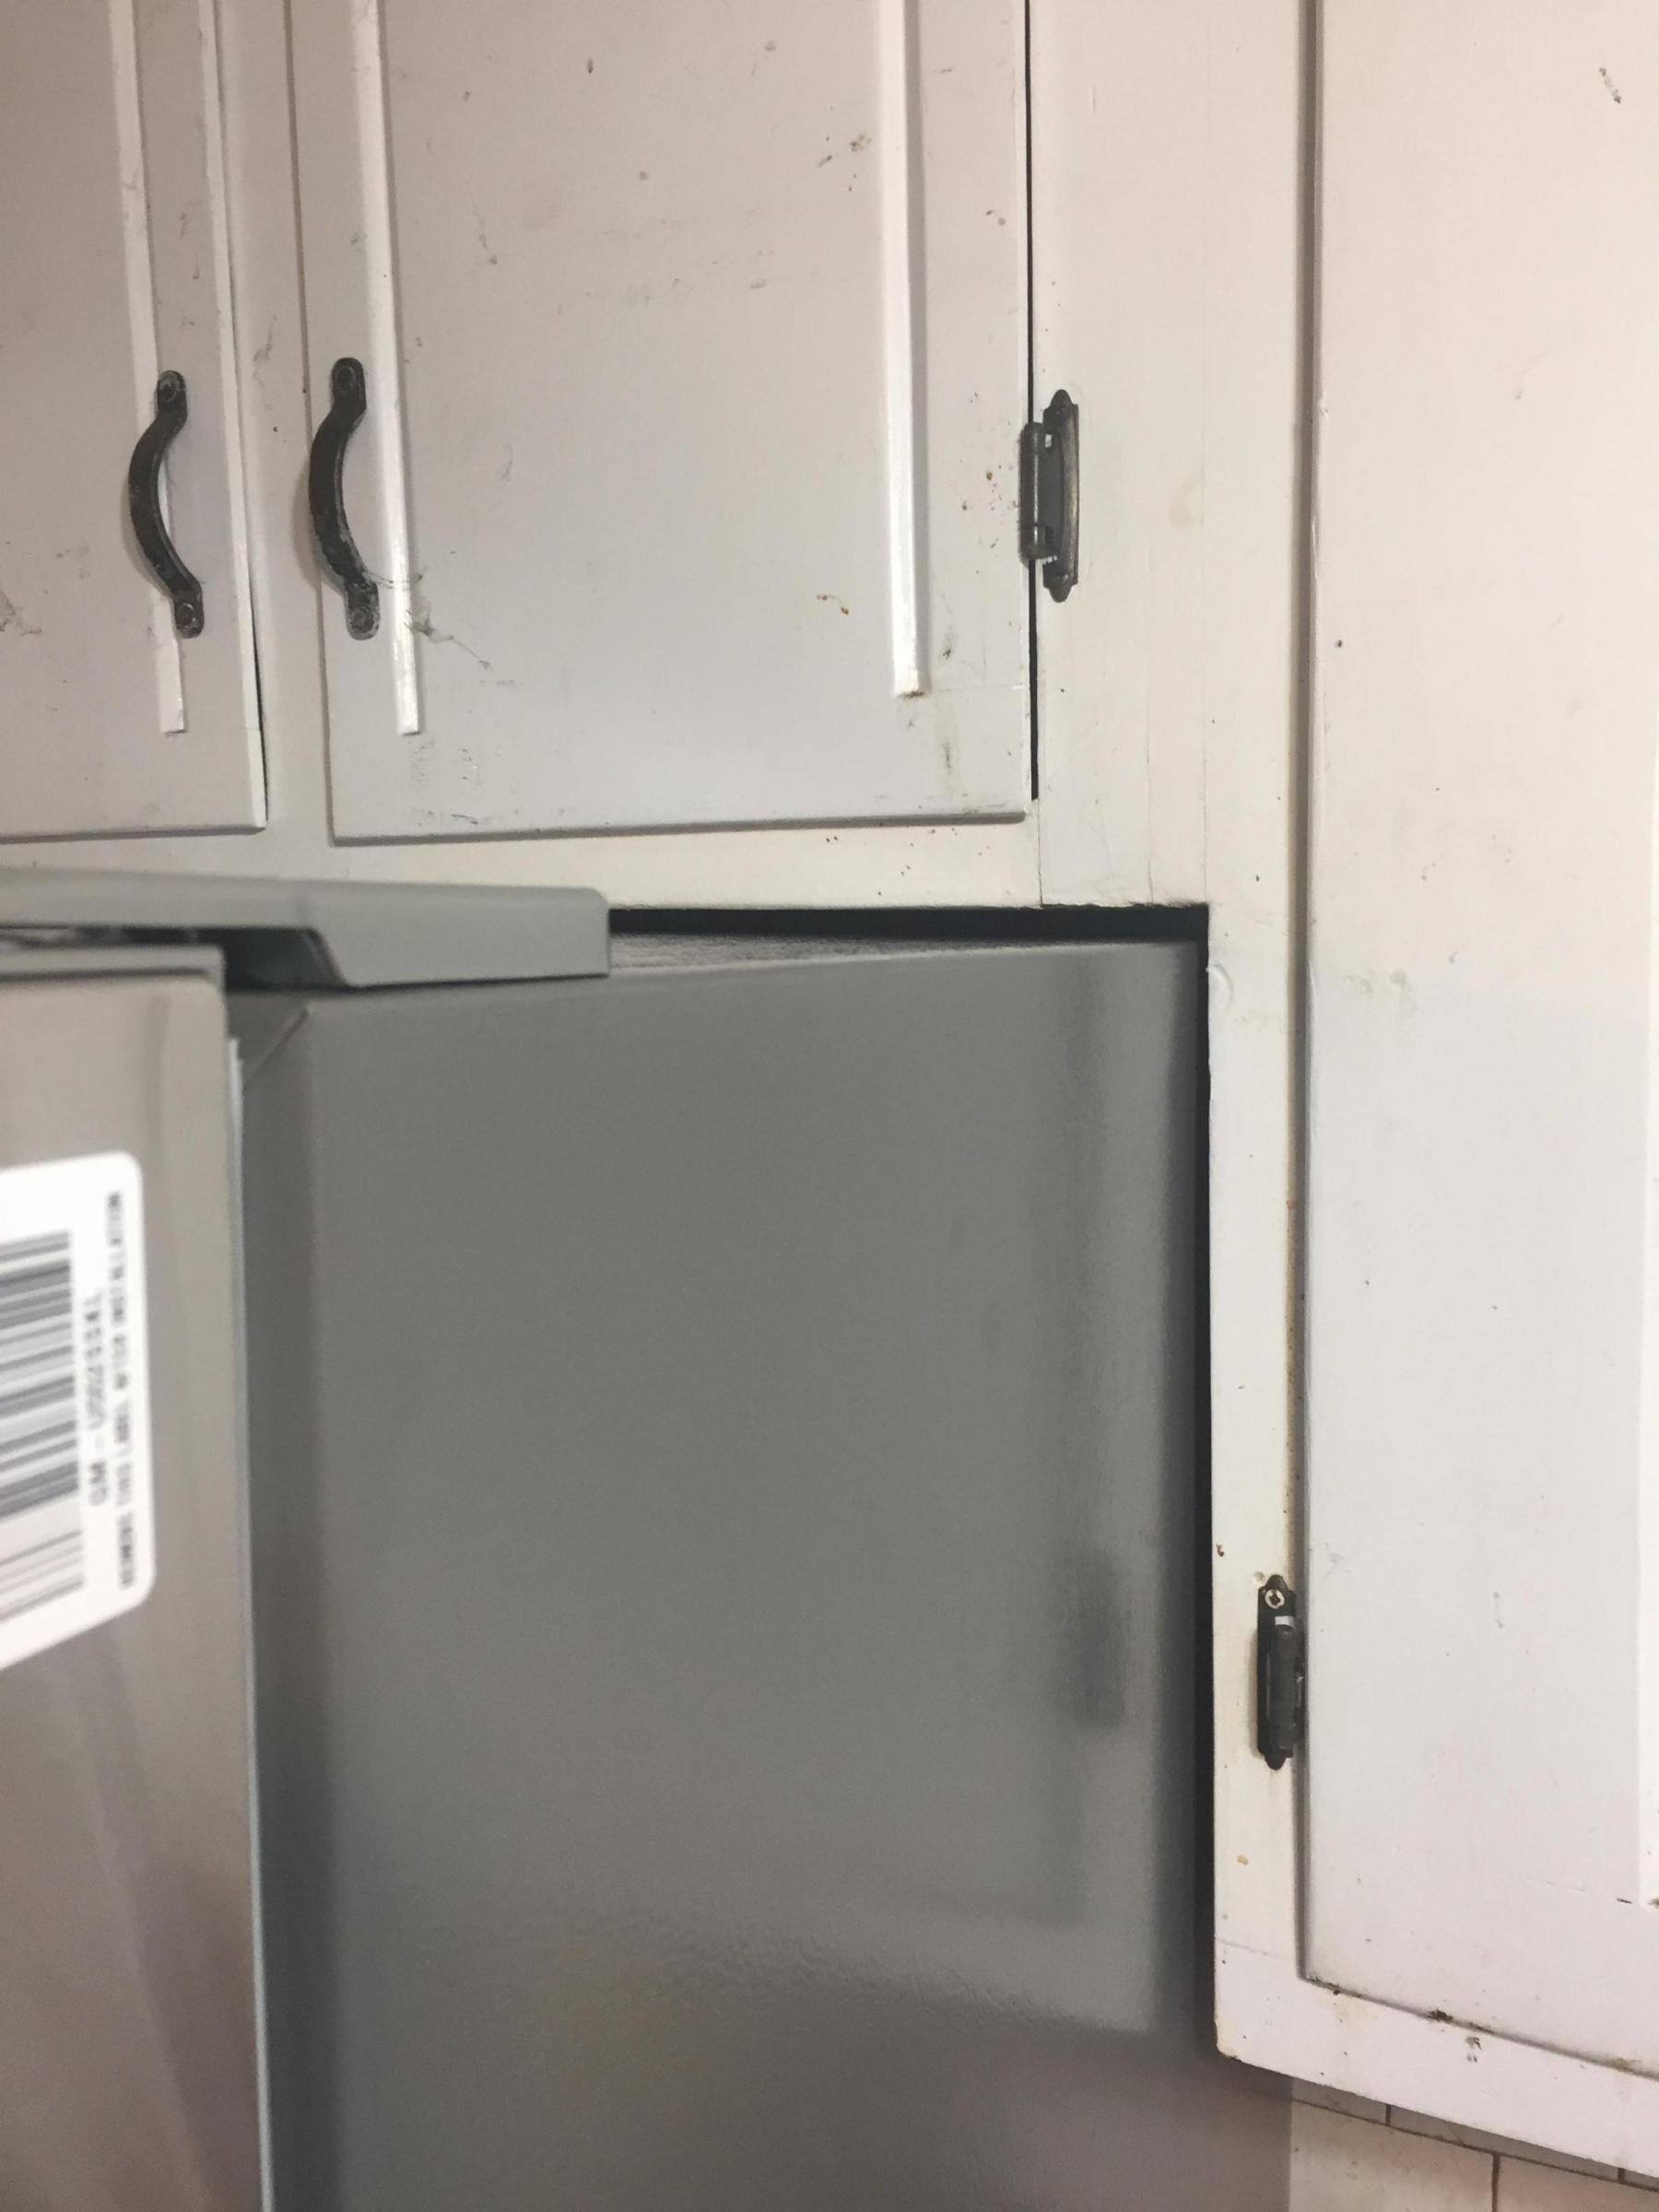 GE fridge won't get cold enough-d9373293-0e26-40e3-a39e-08dbe5a887a6_1546310629768.jpg